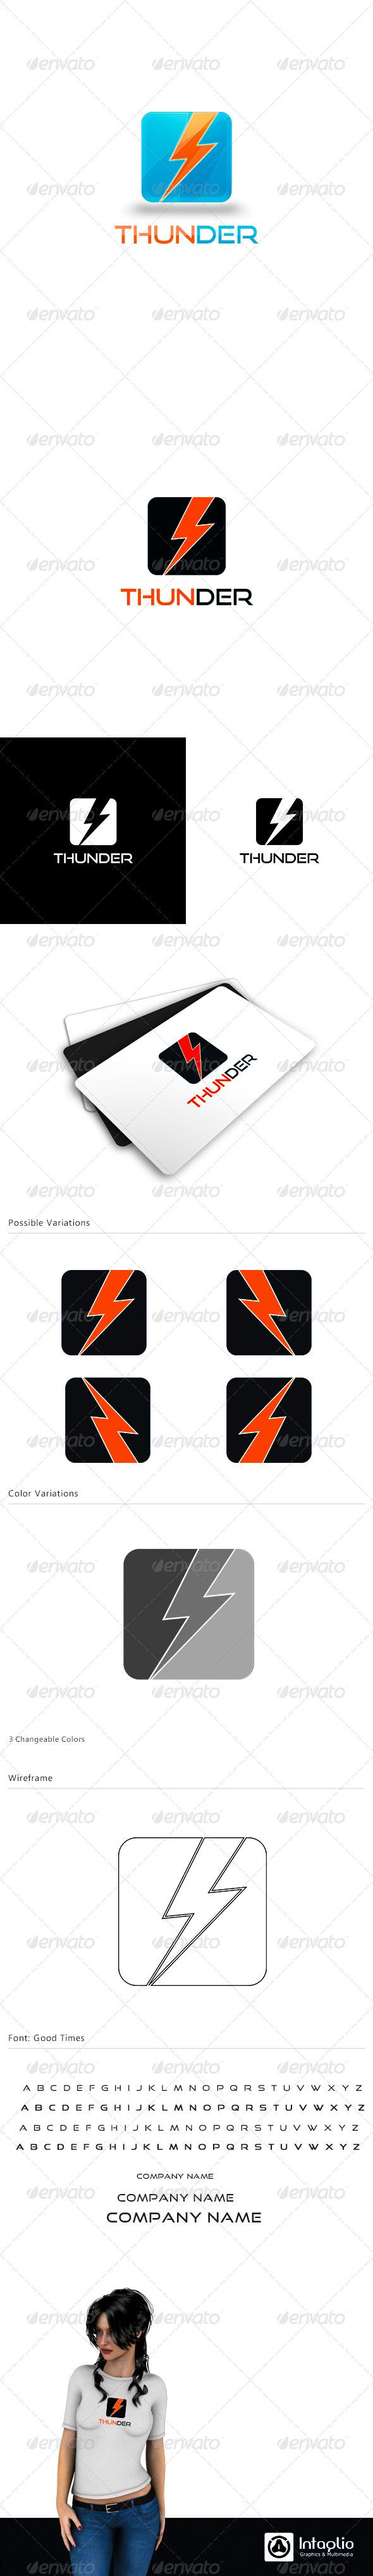 Creative Logo - Thunder